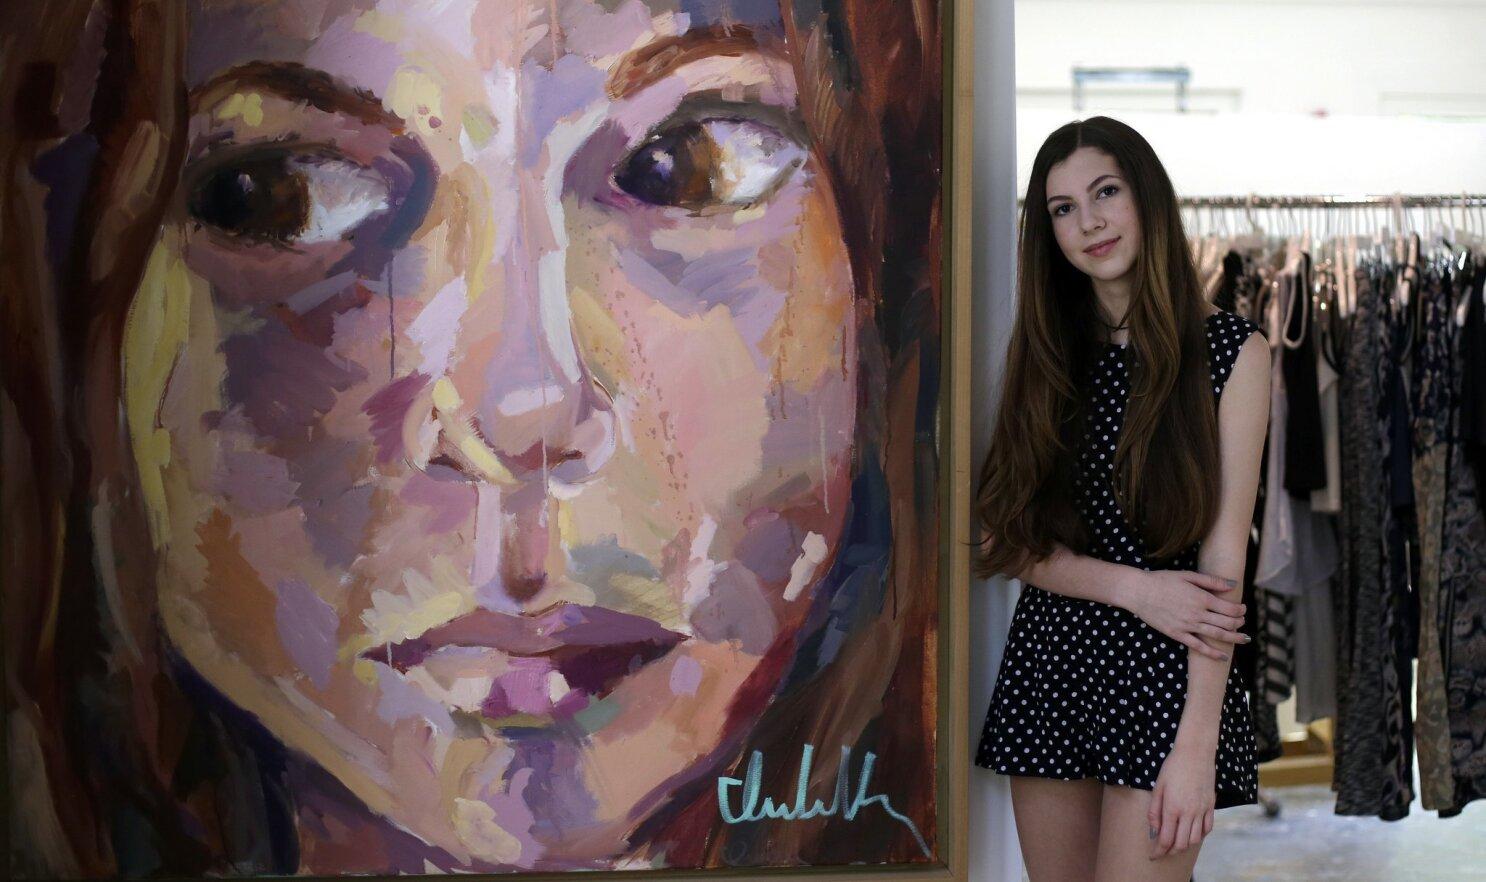 13 Year Old Texas Fashion Designer Finds Success The San Diego Union Tribune